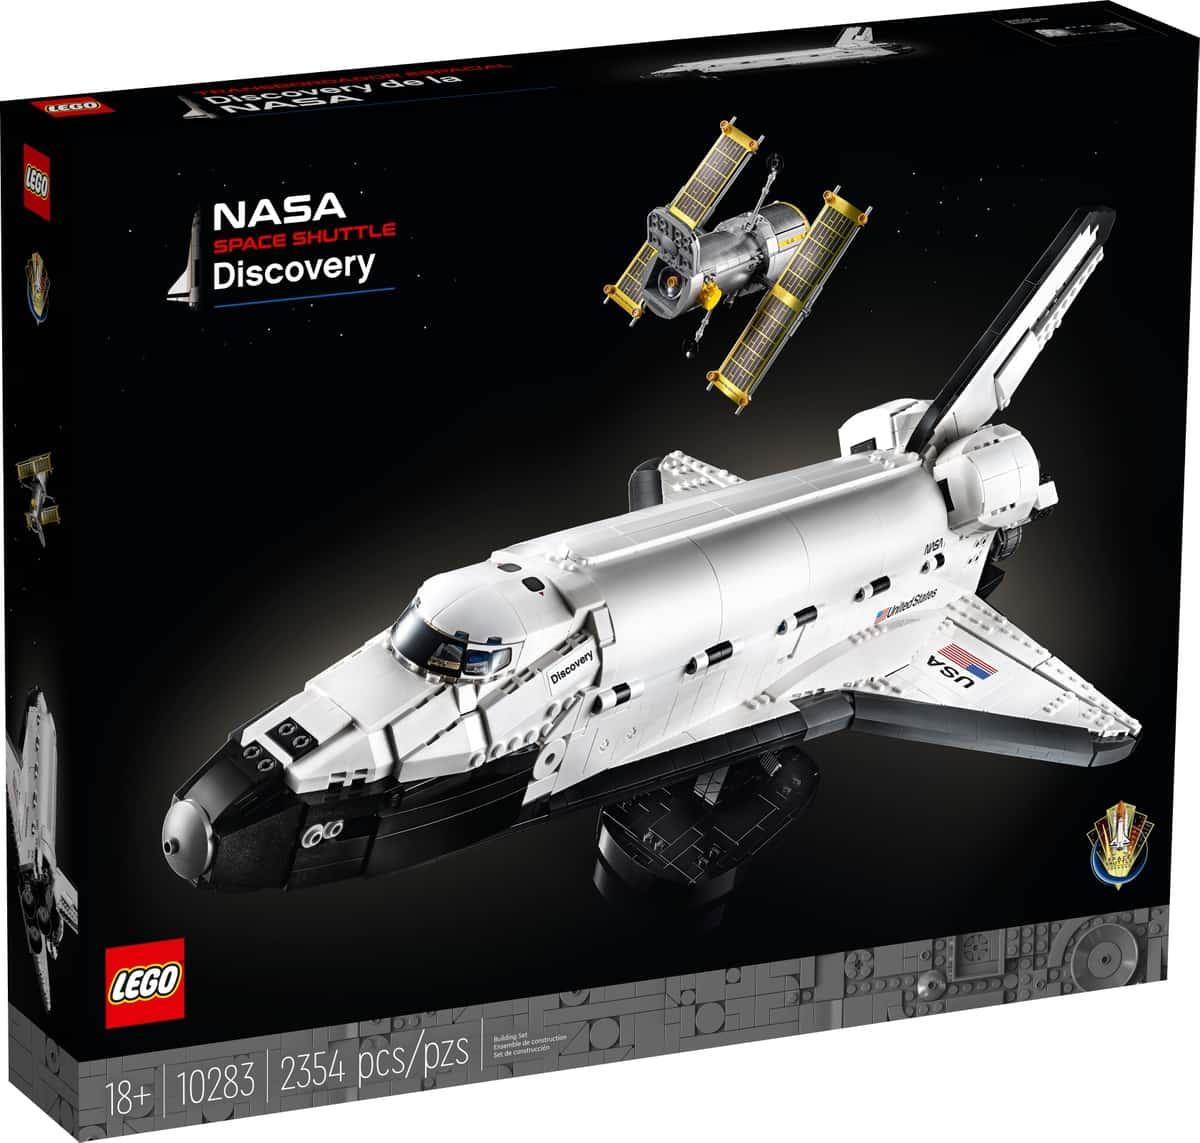 lego 10283 nasa space shuttle discovery